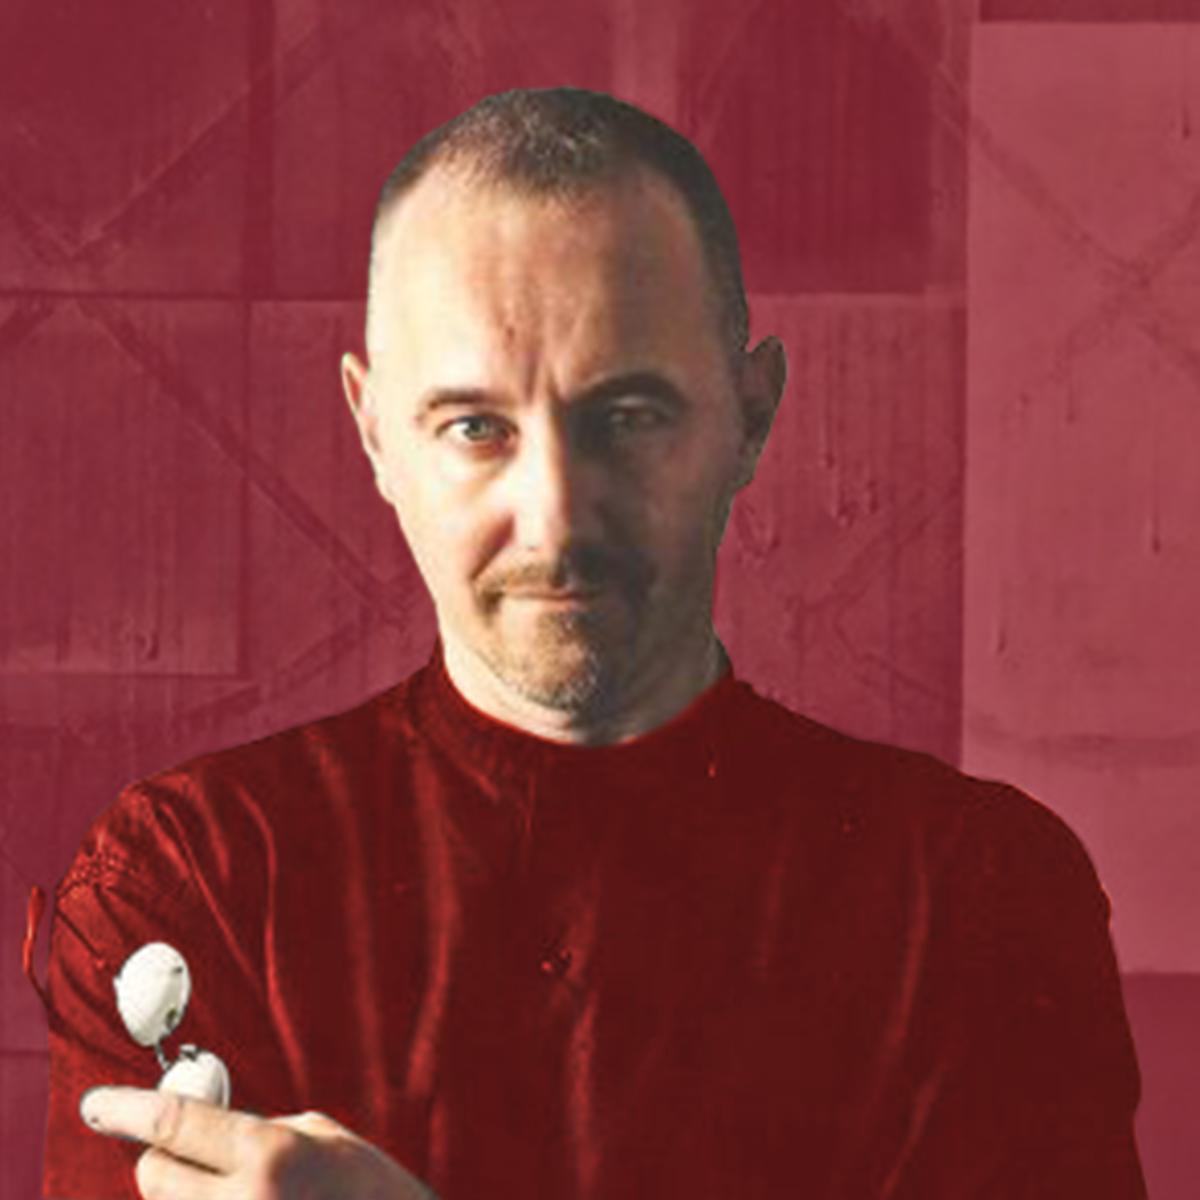 Roberto Floreani